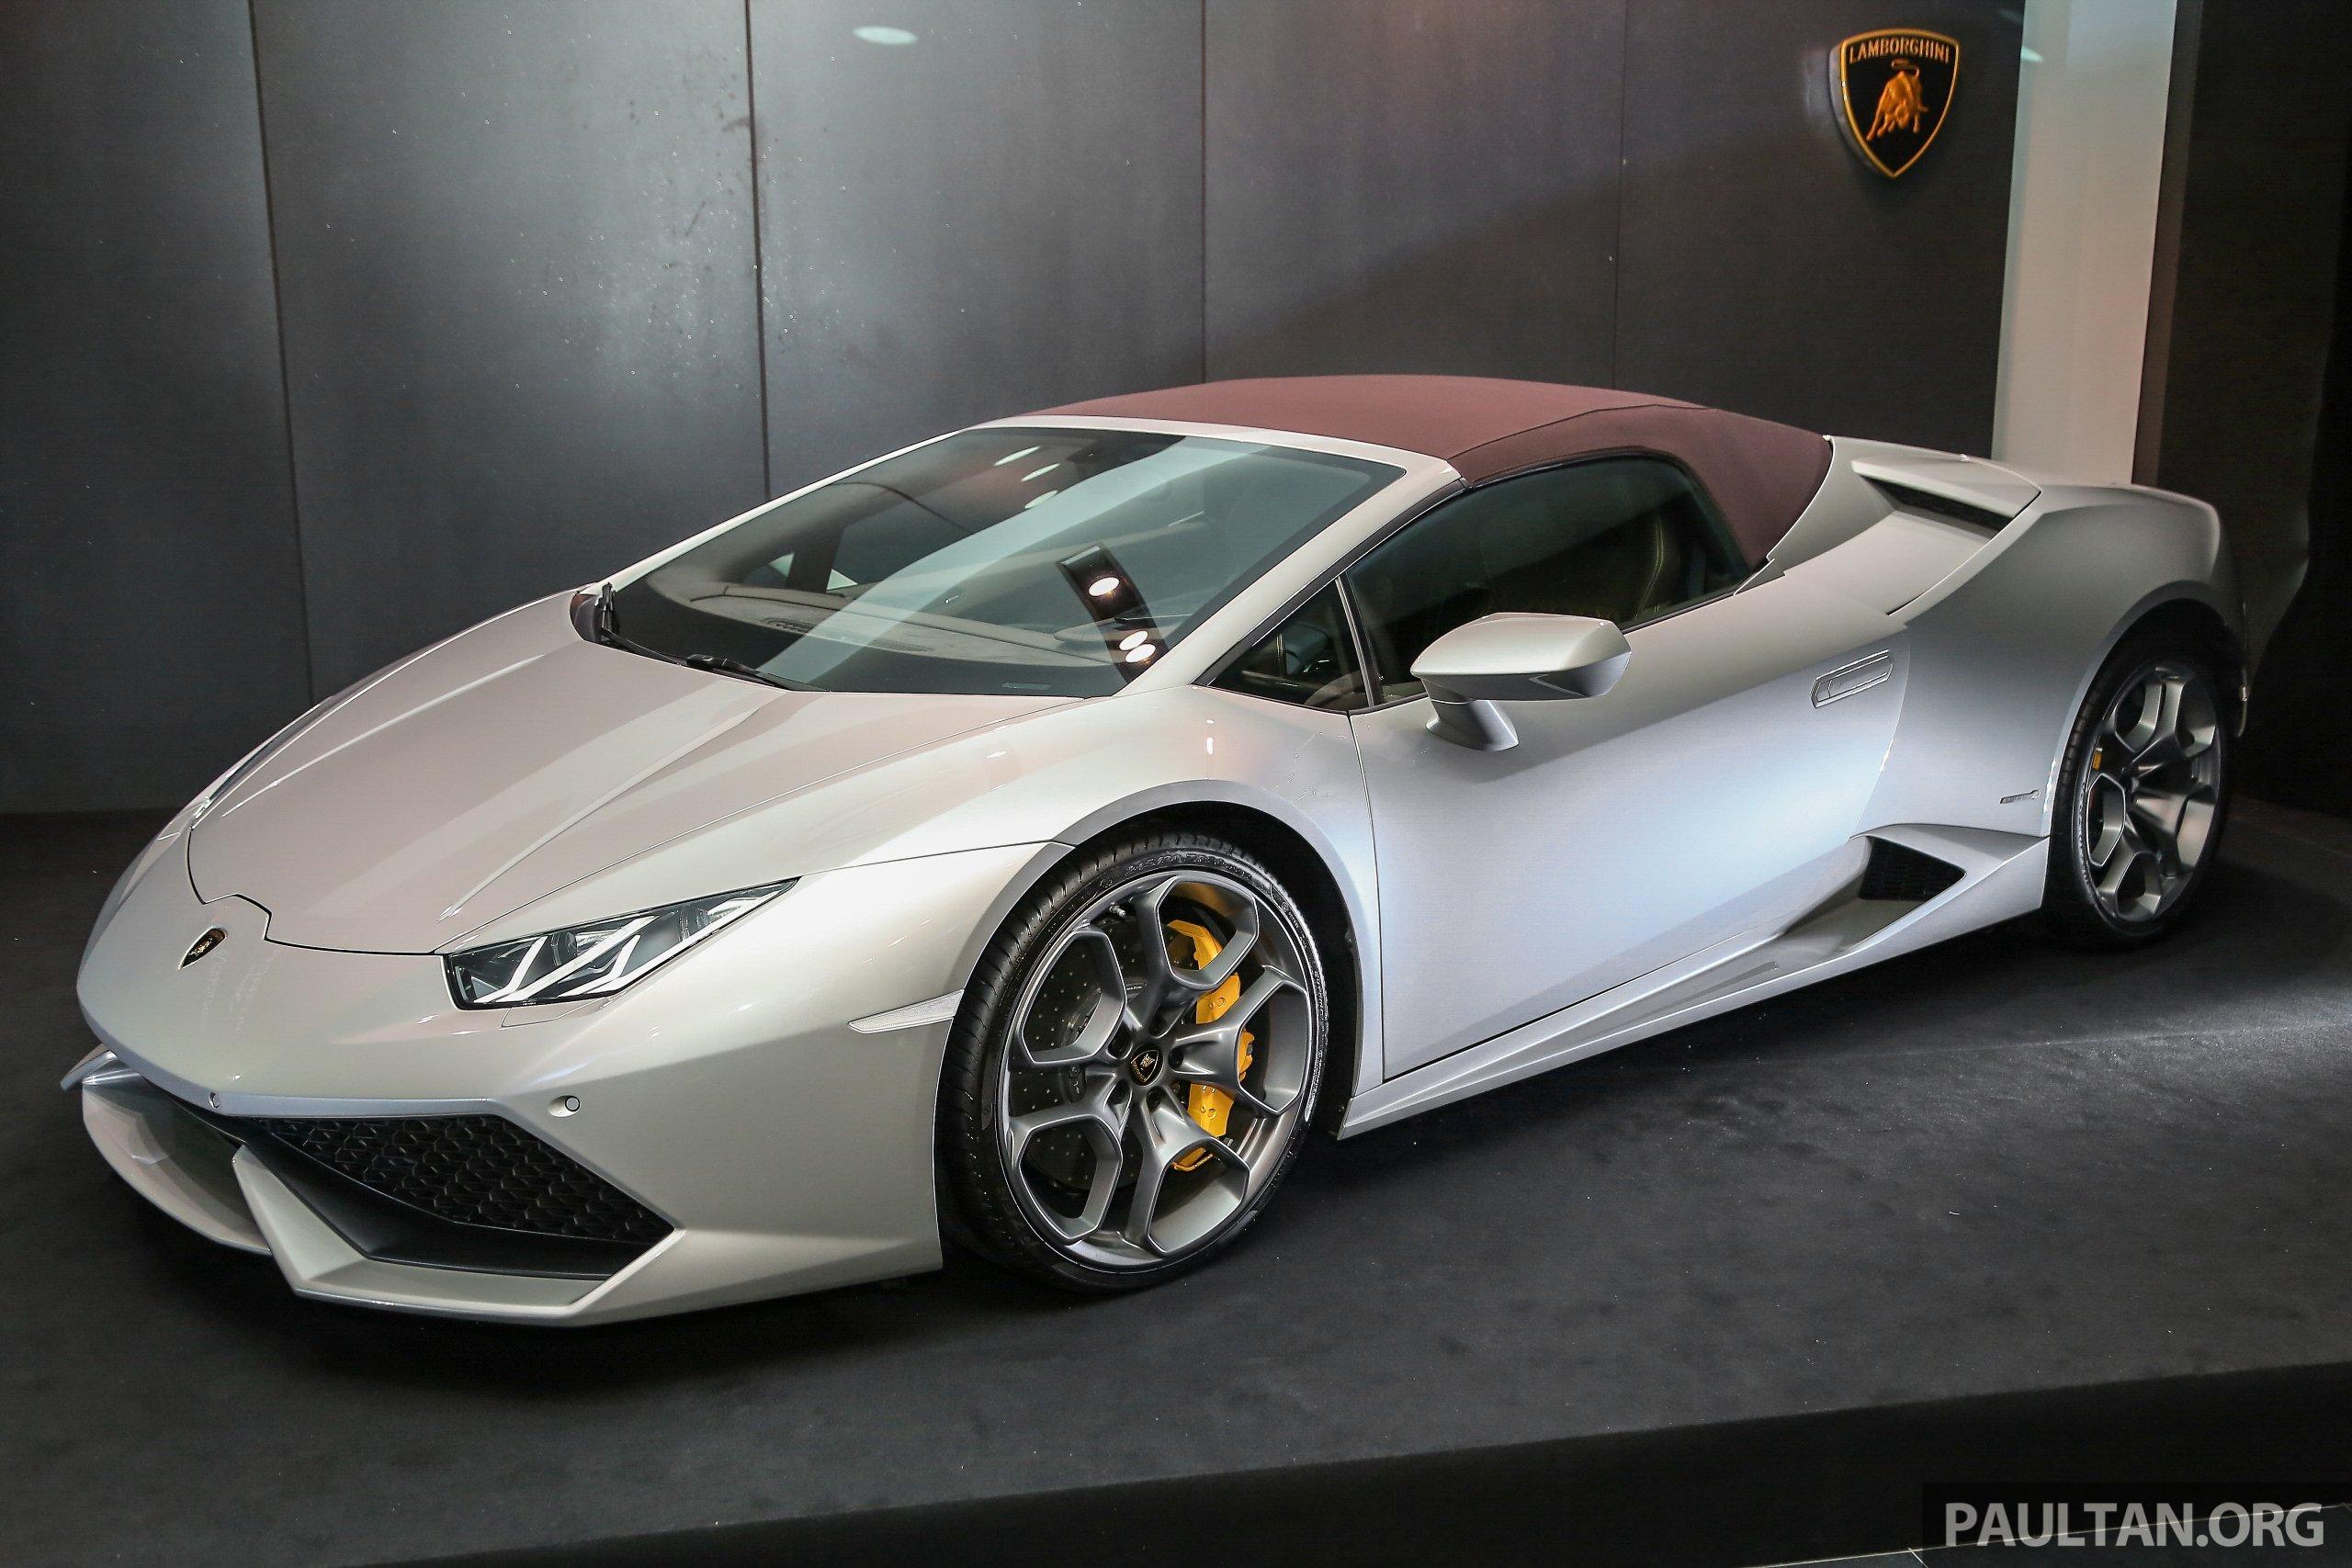 Lamborghini Huracan Spyder >> Lamborghini Huracan Spyder now in M'sia, fr RM1.35m Image 403677